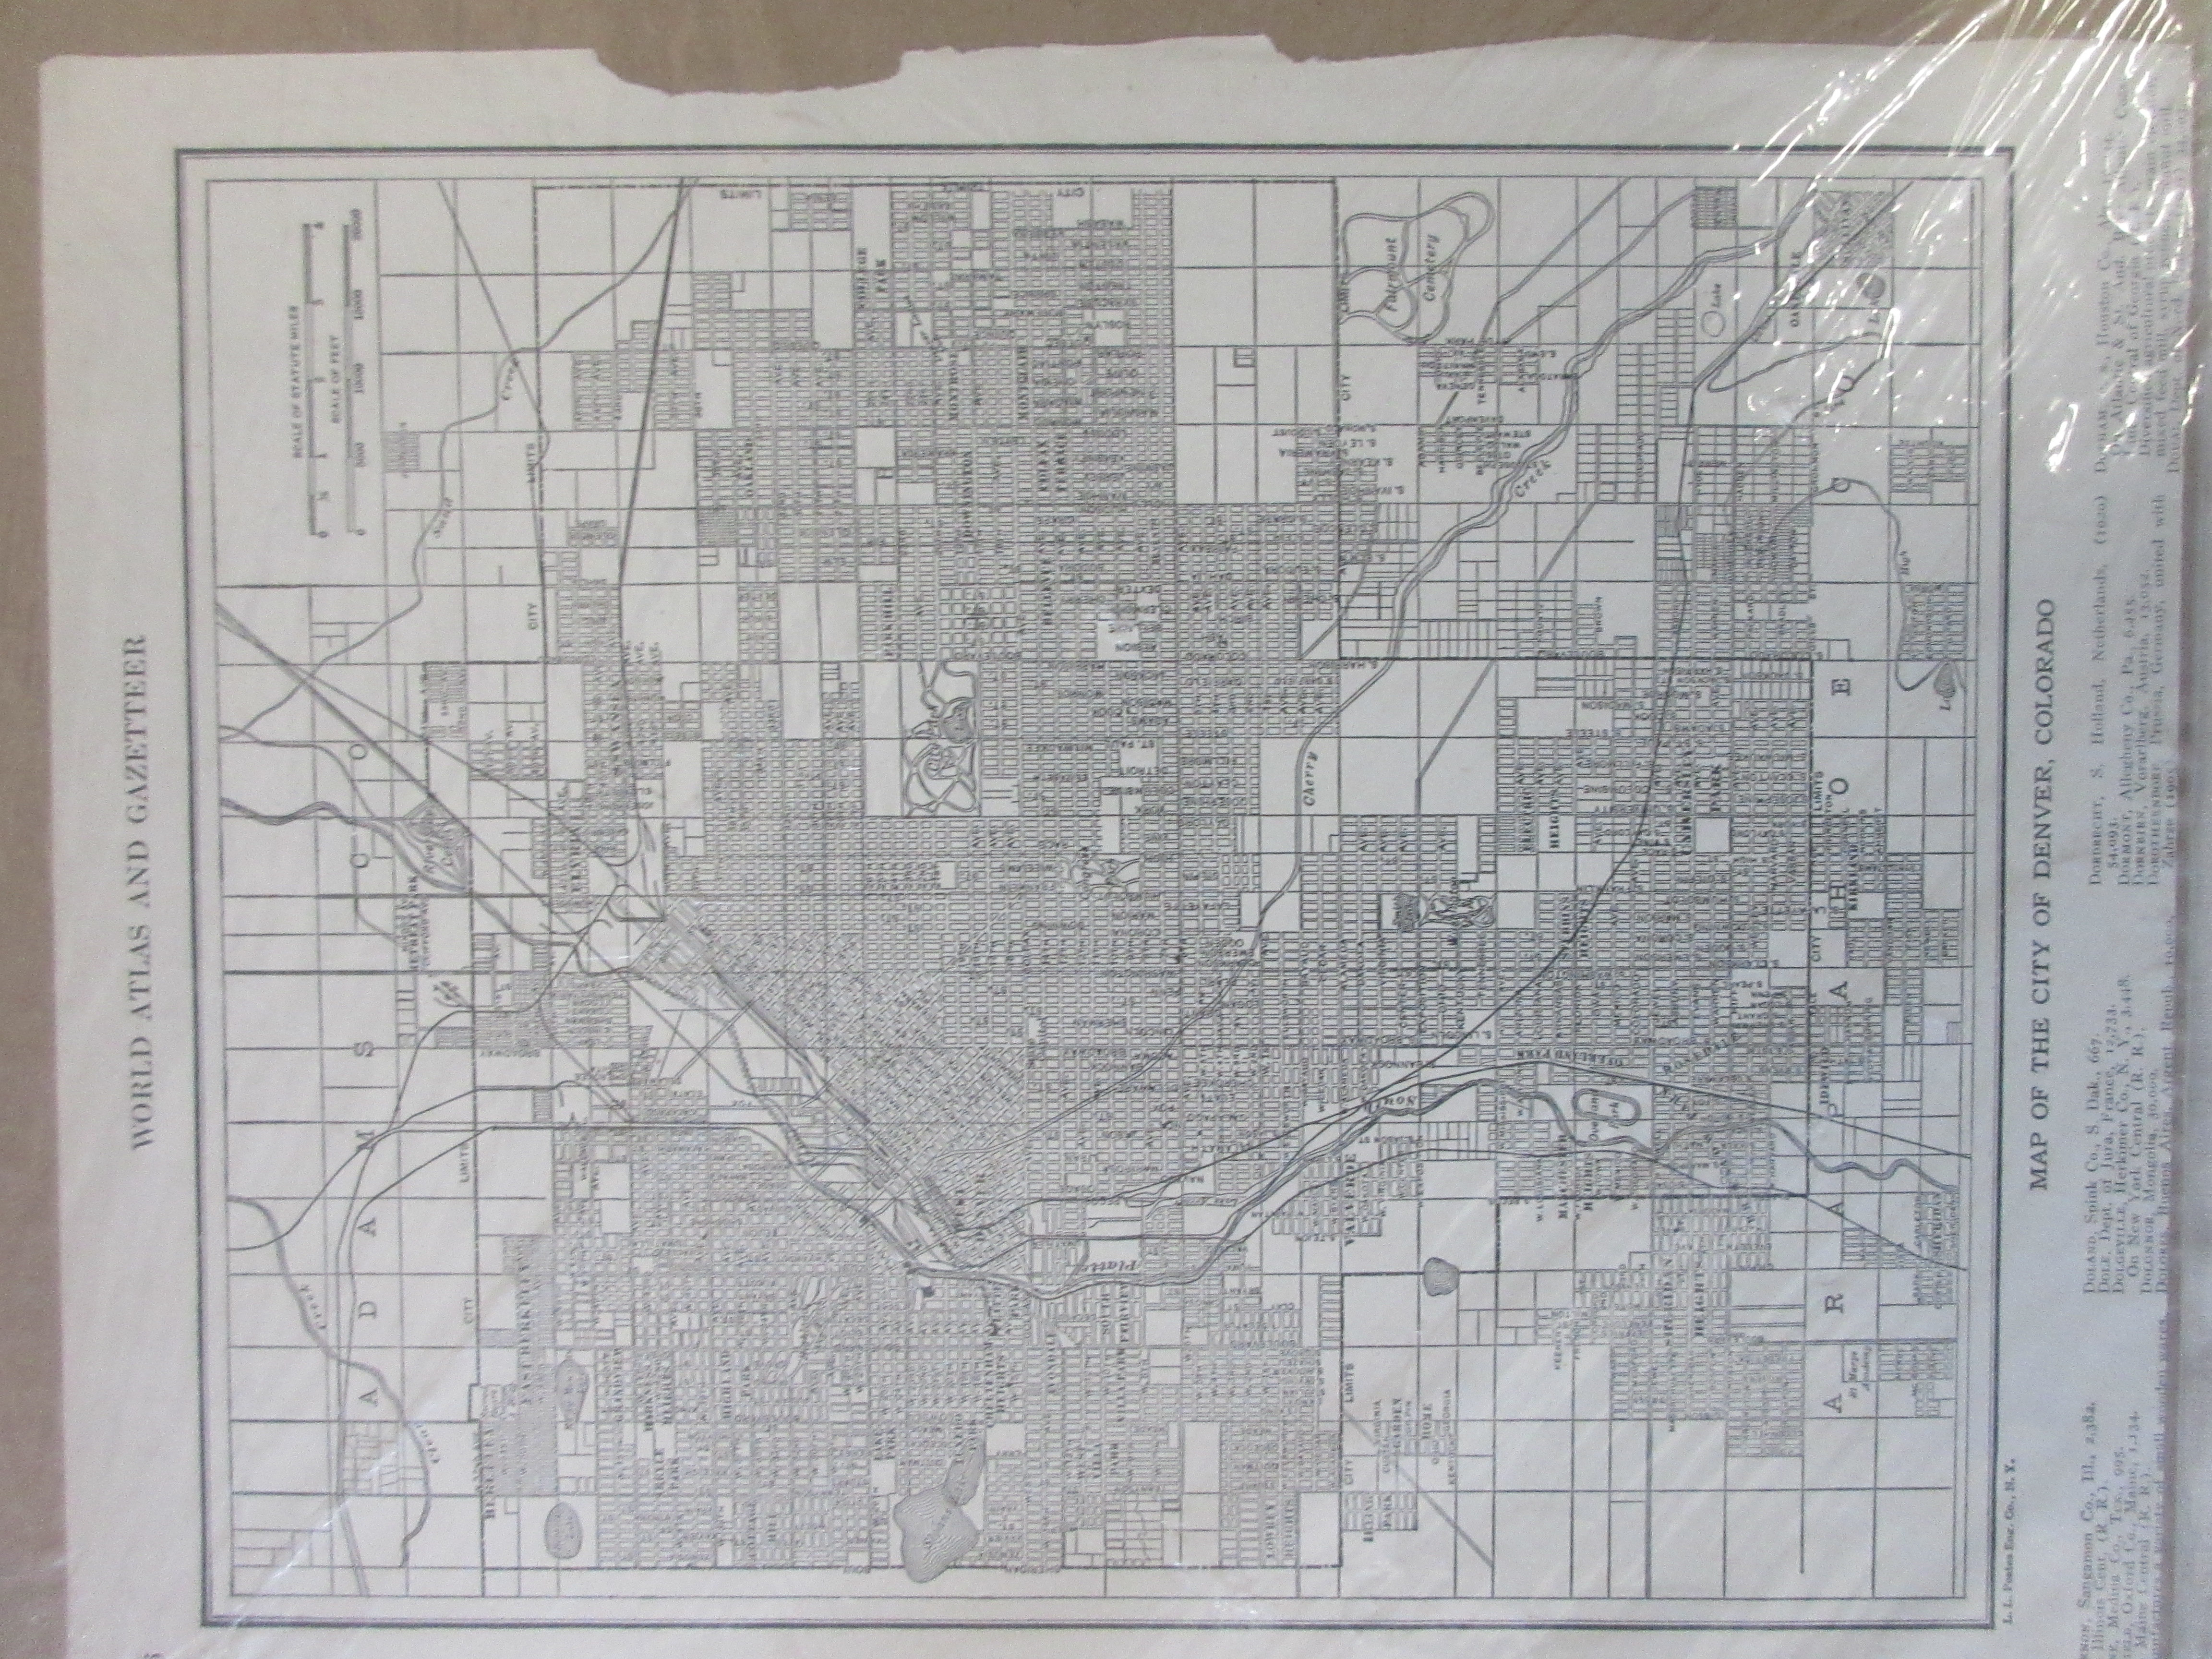 Denver, Colorado Map, 1925 By L.L. Poates | vintage-renovaters on